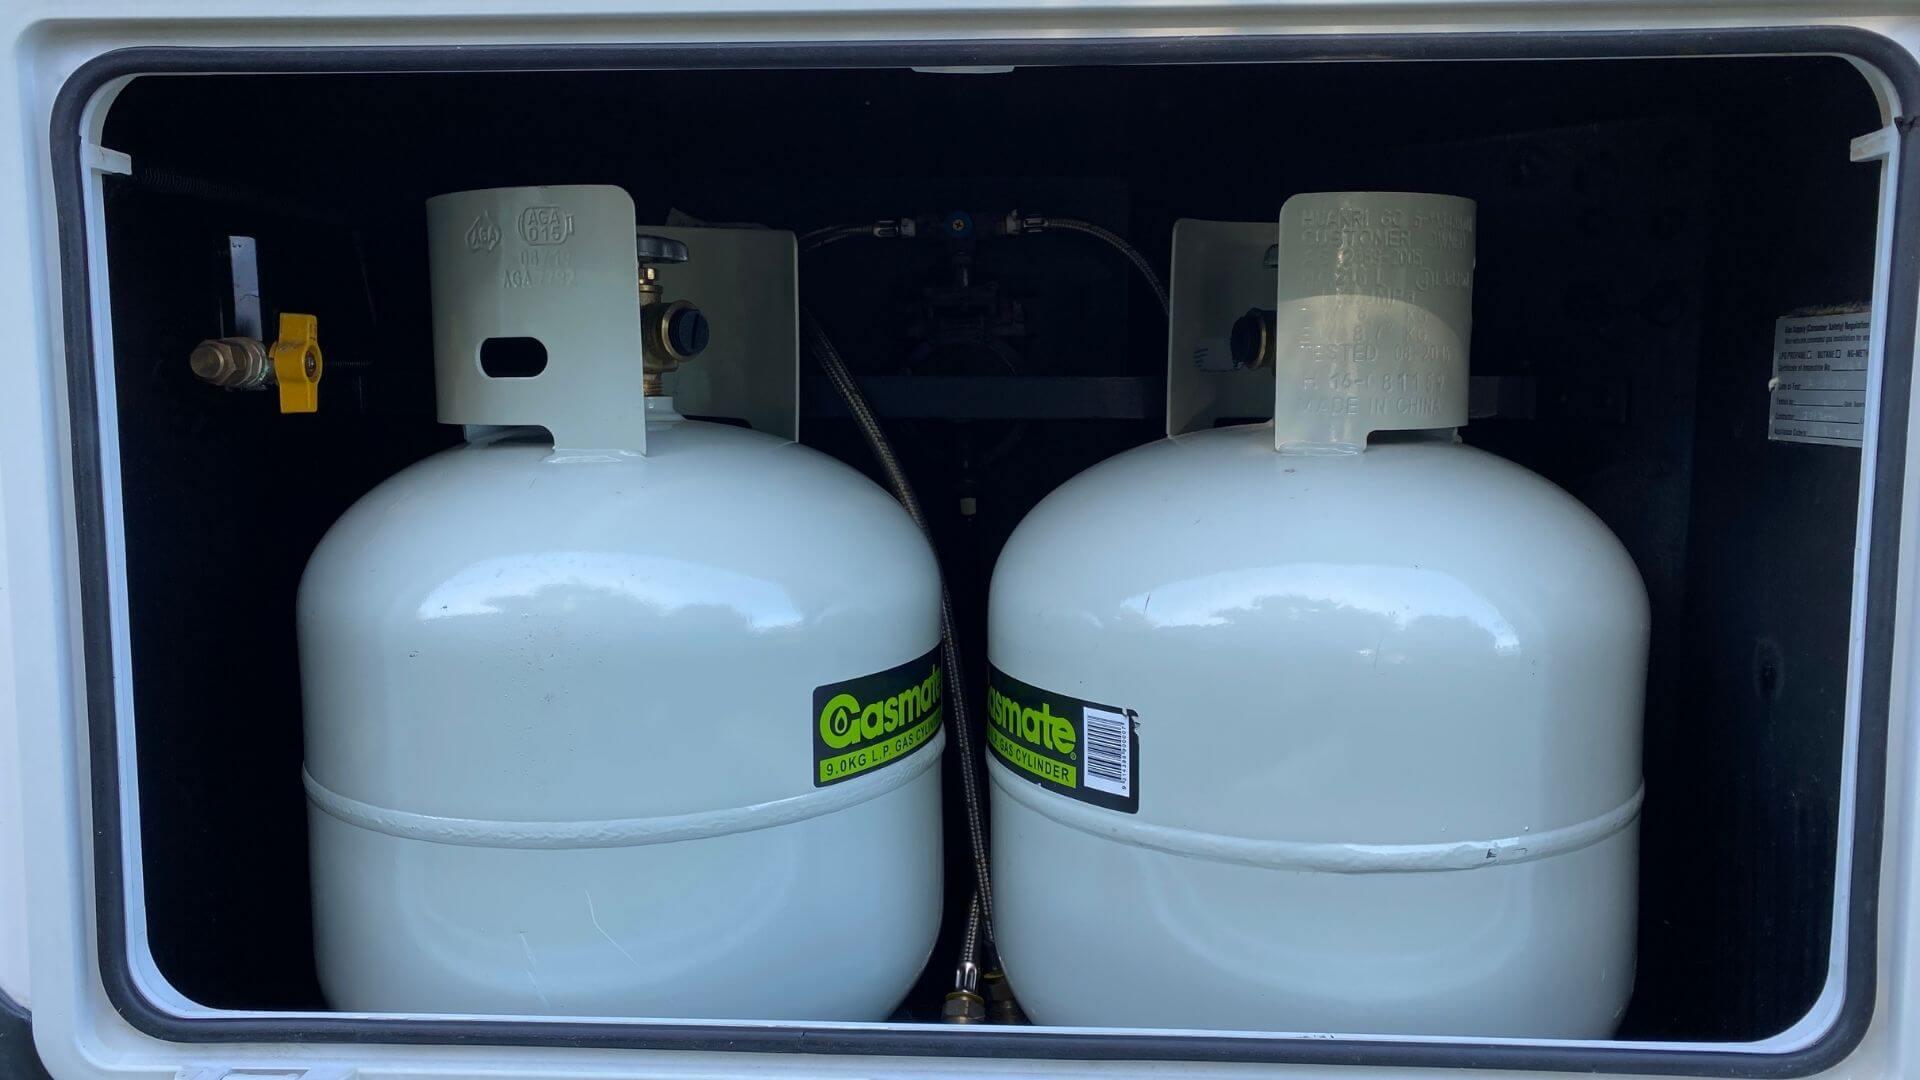 New gas bottles